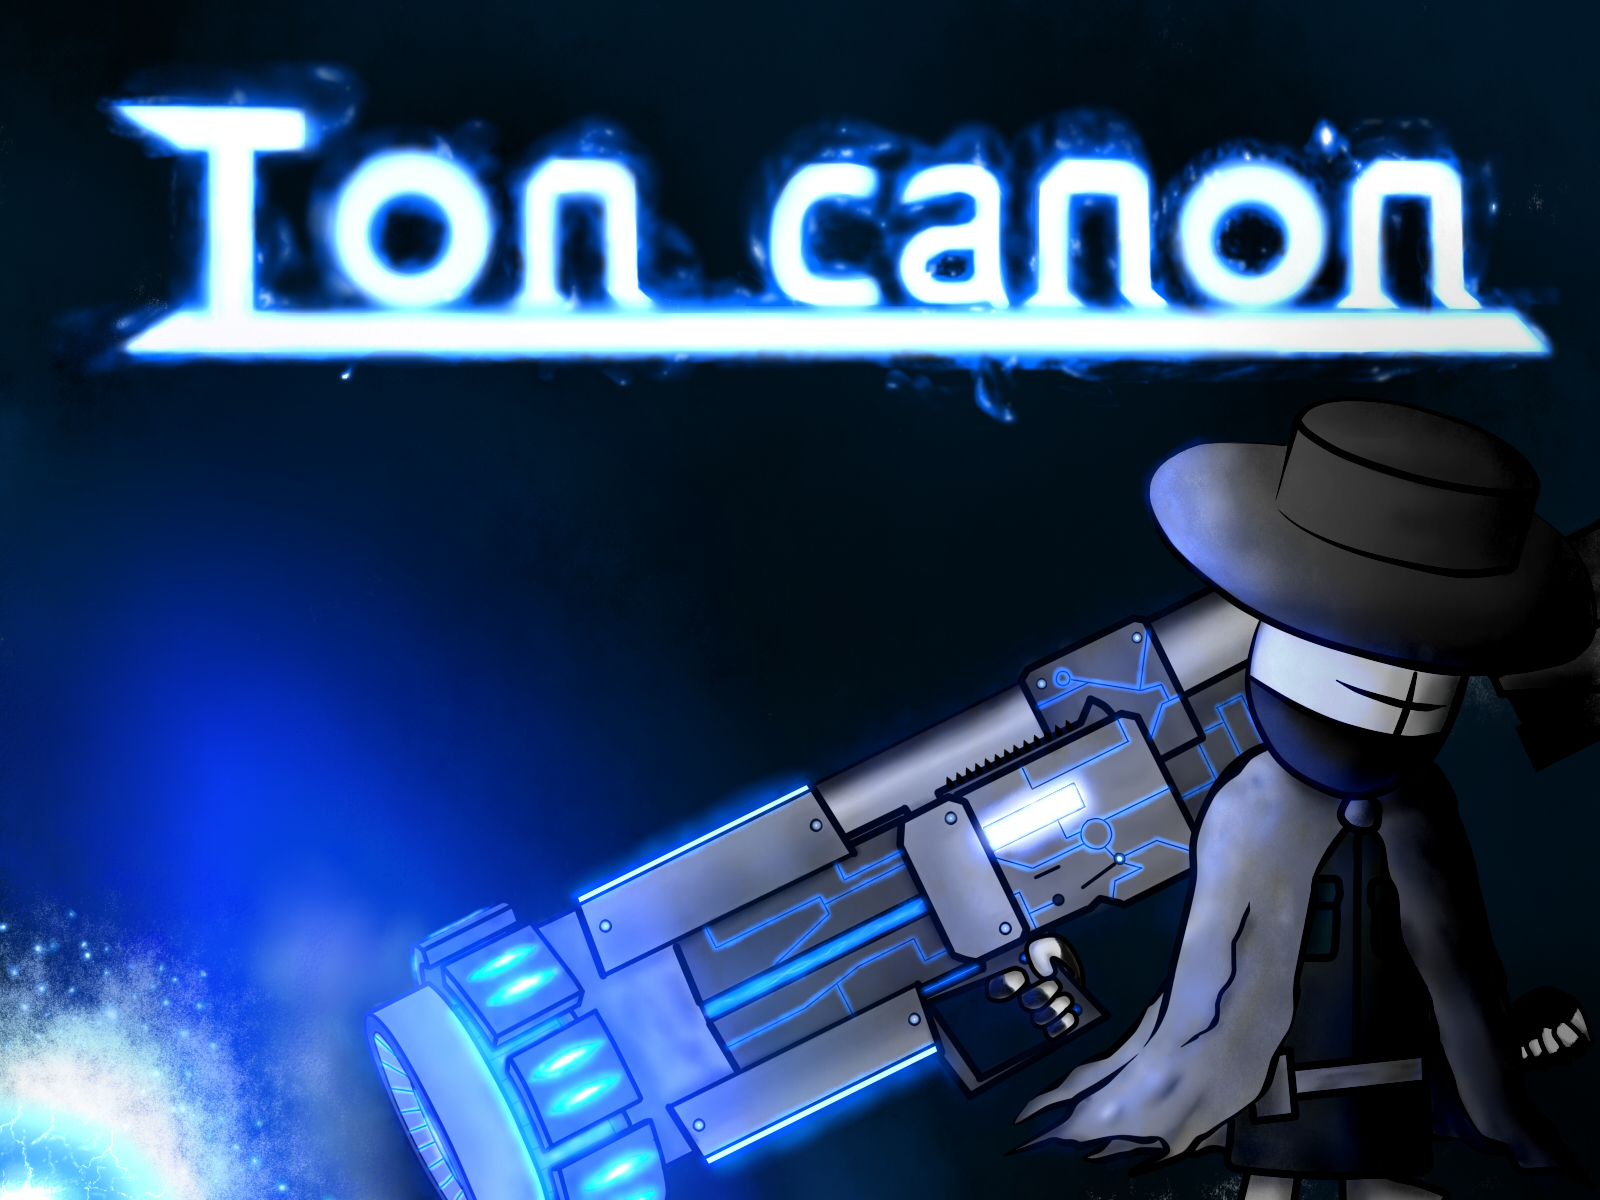 Ion canon